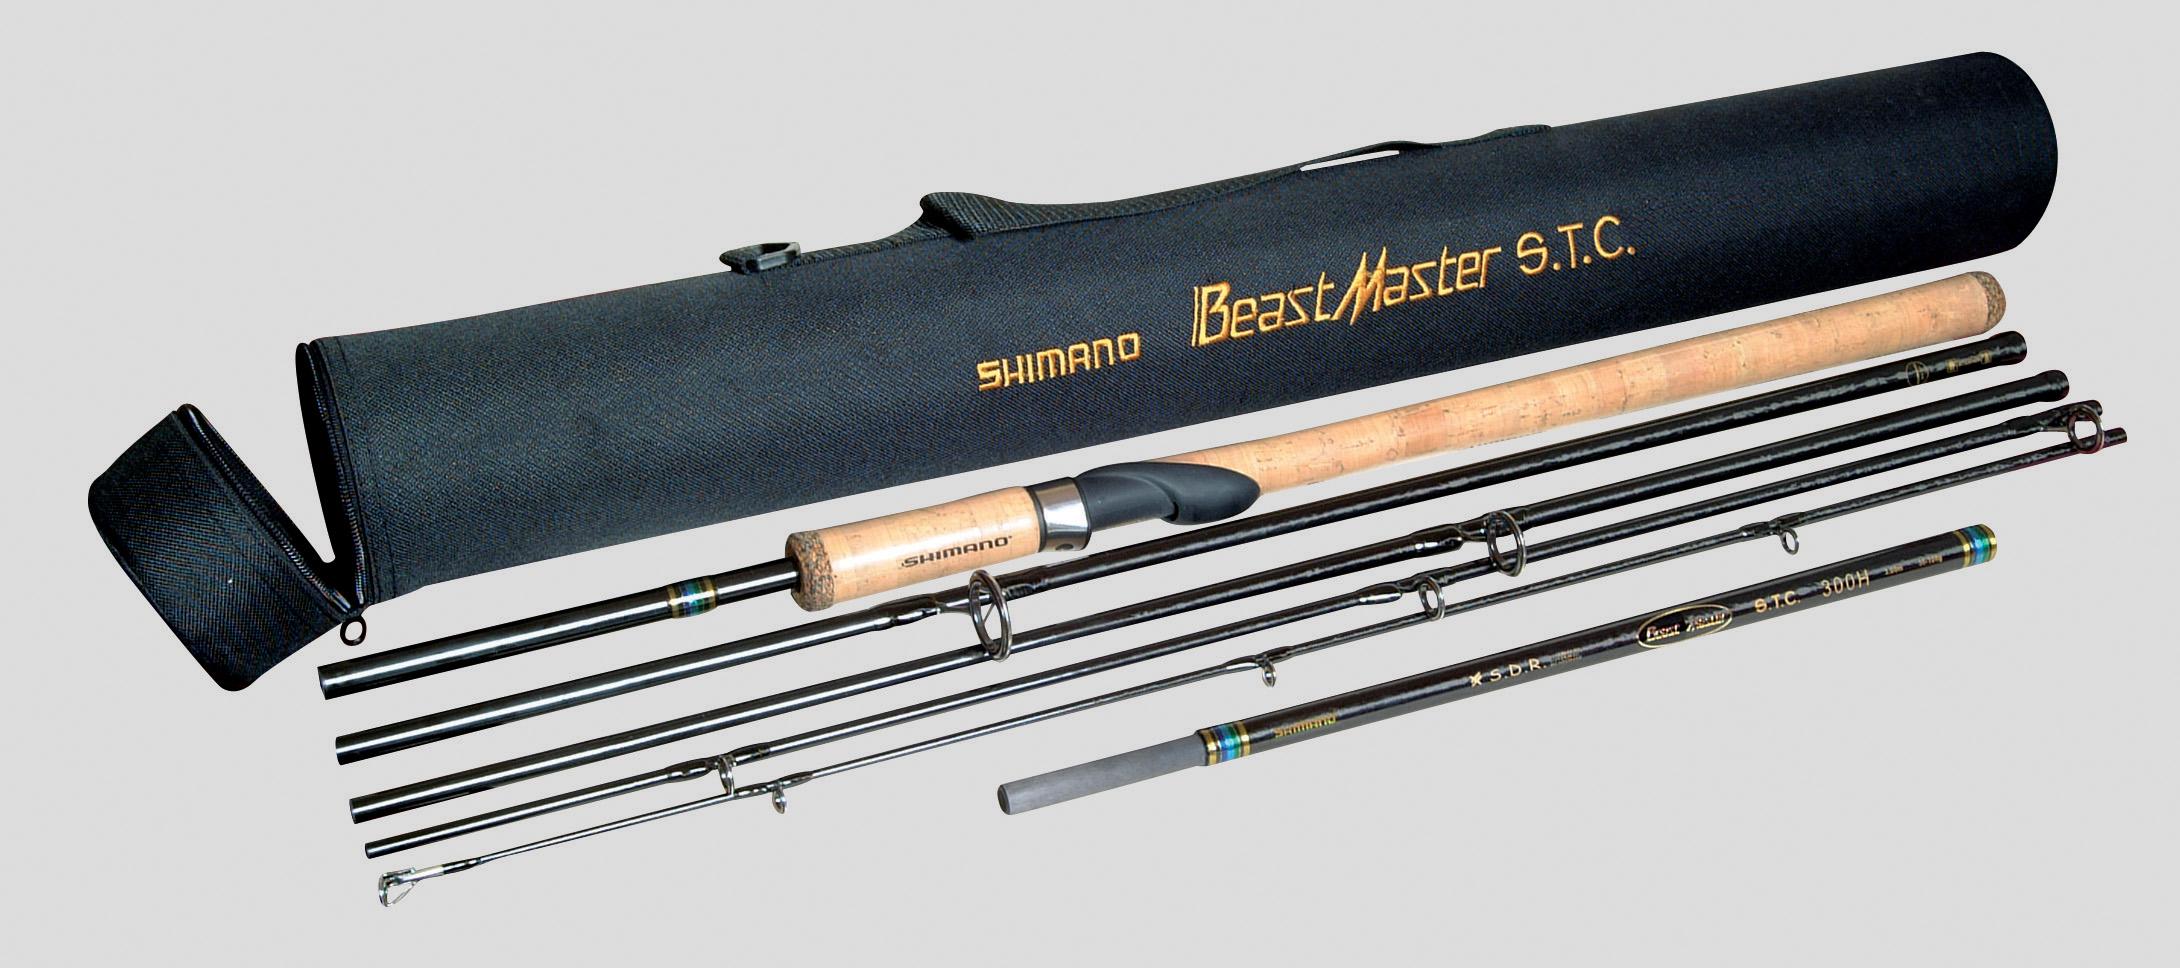 Shimano Beastmaster STC Spinning Rod lure fishing rod — Sea Angler